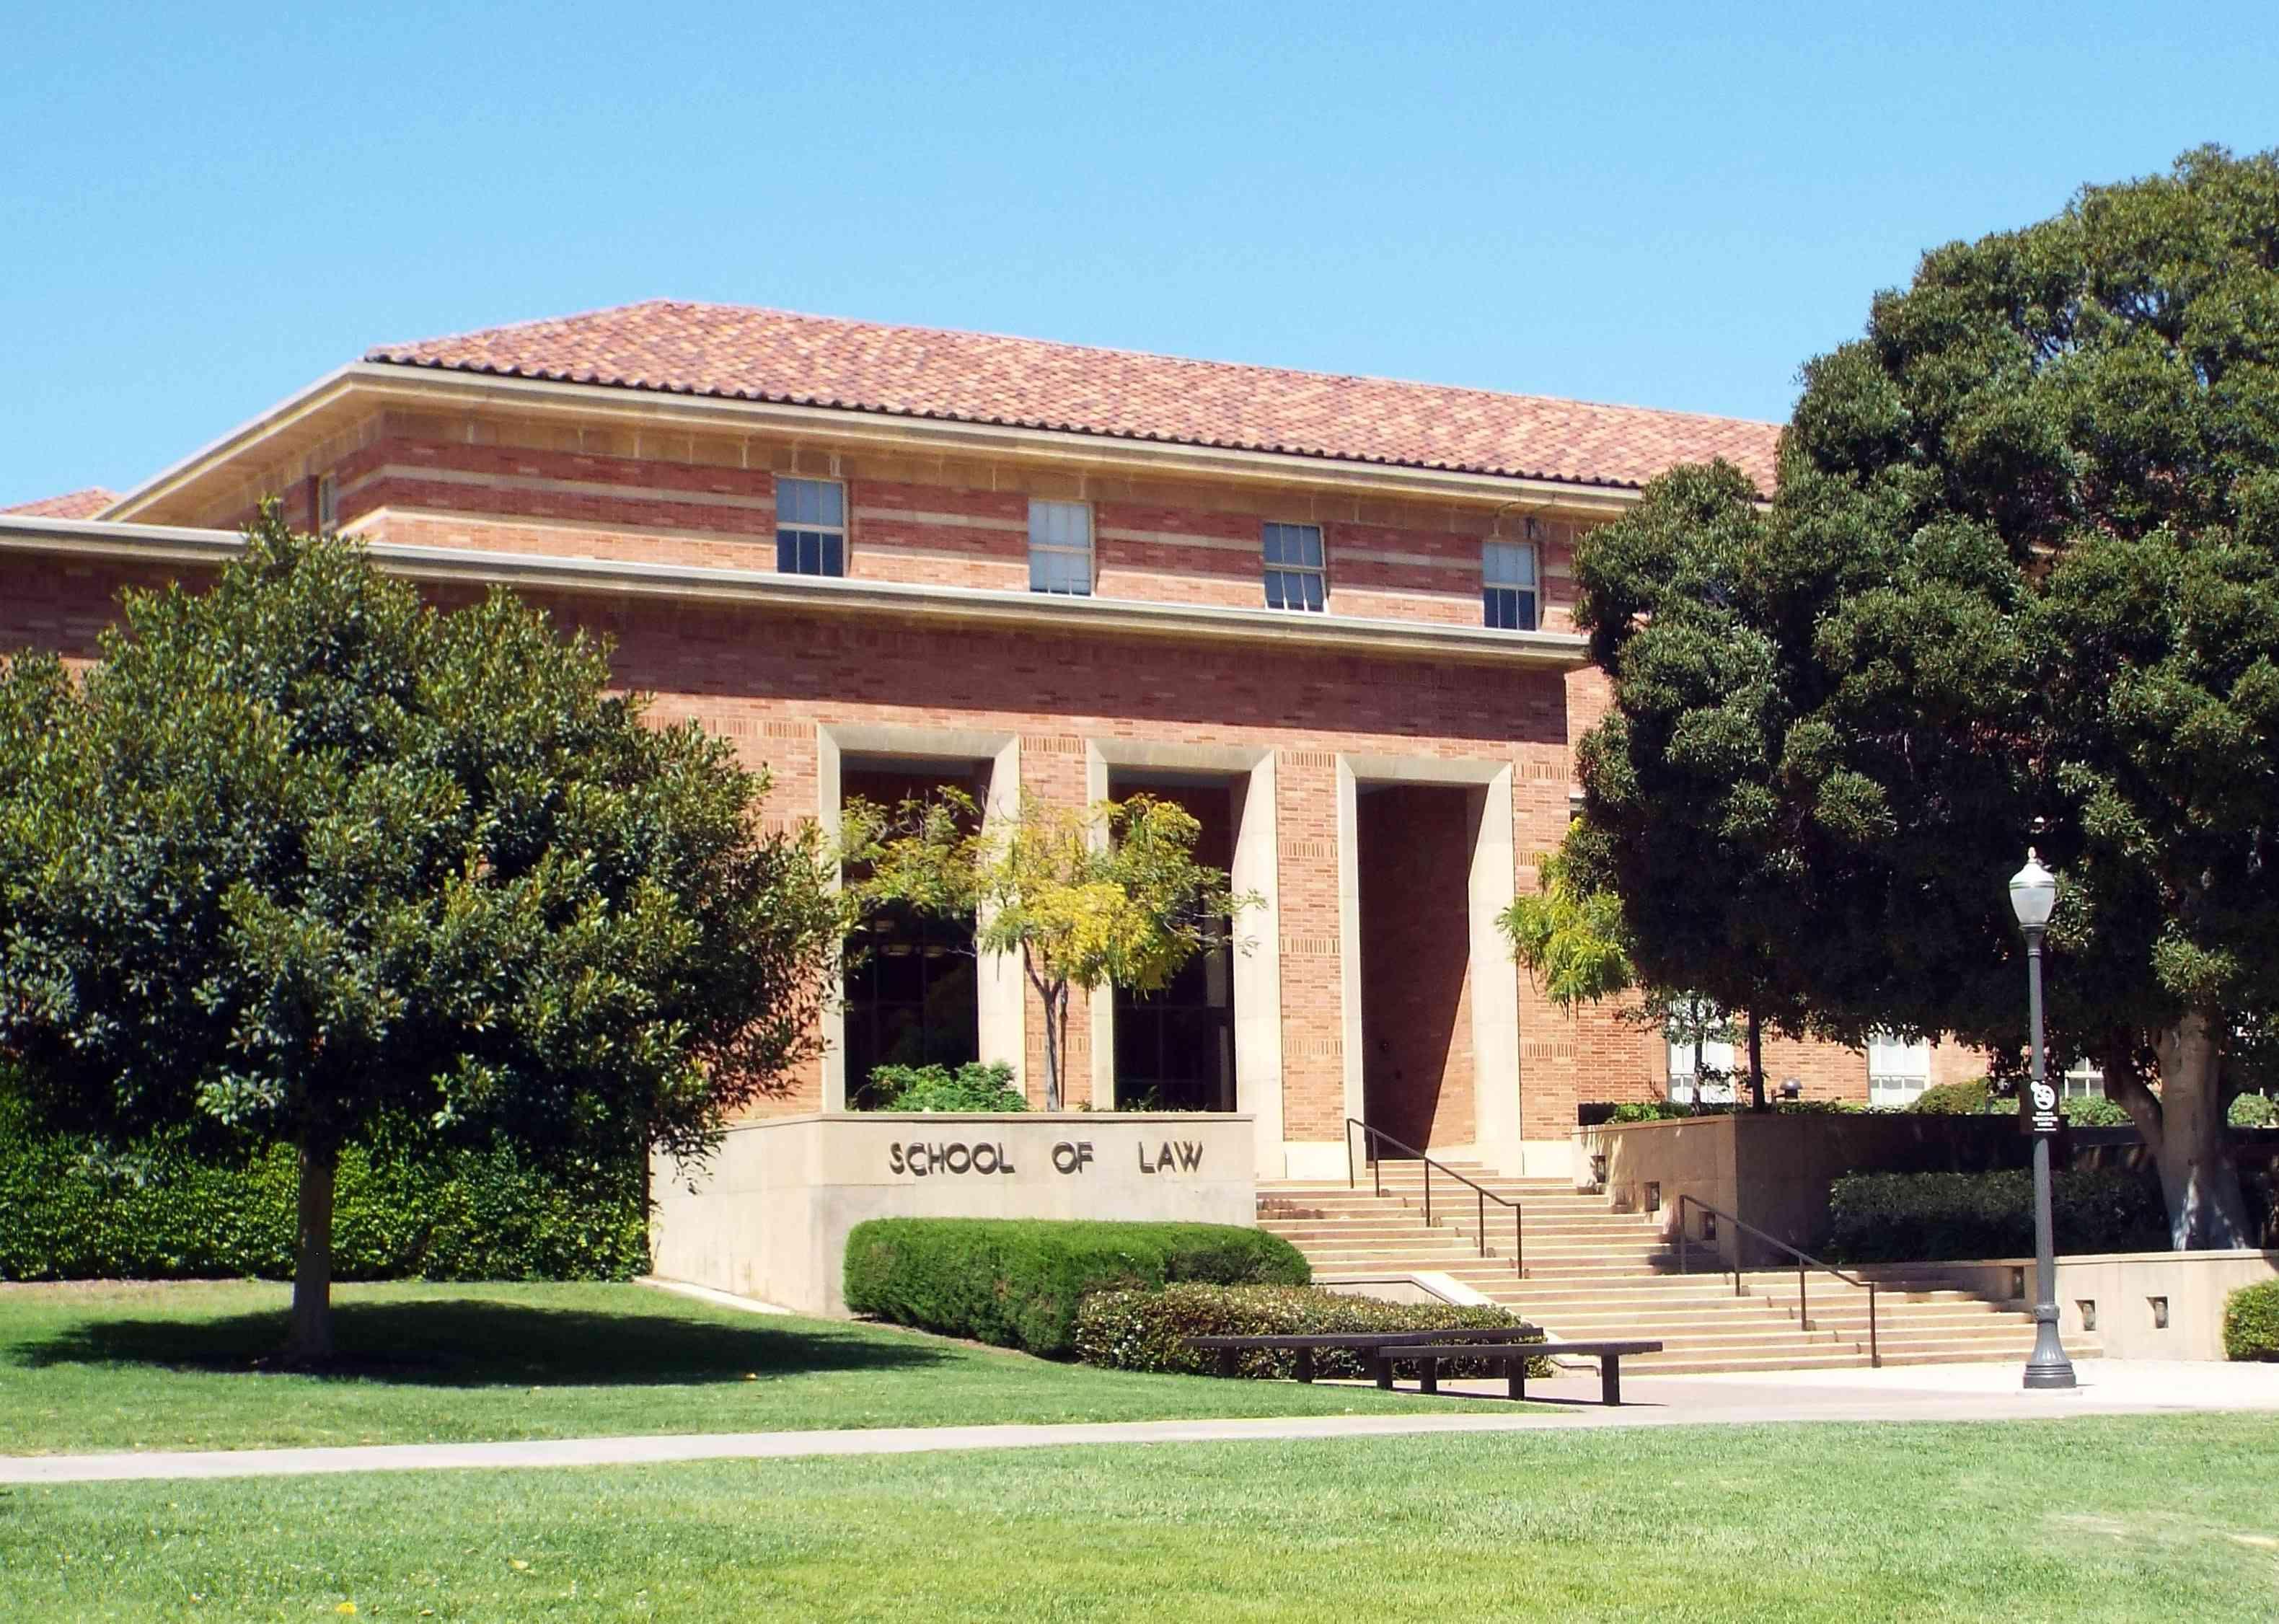 UCLA School of Law